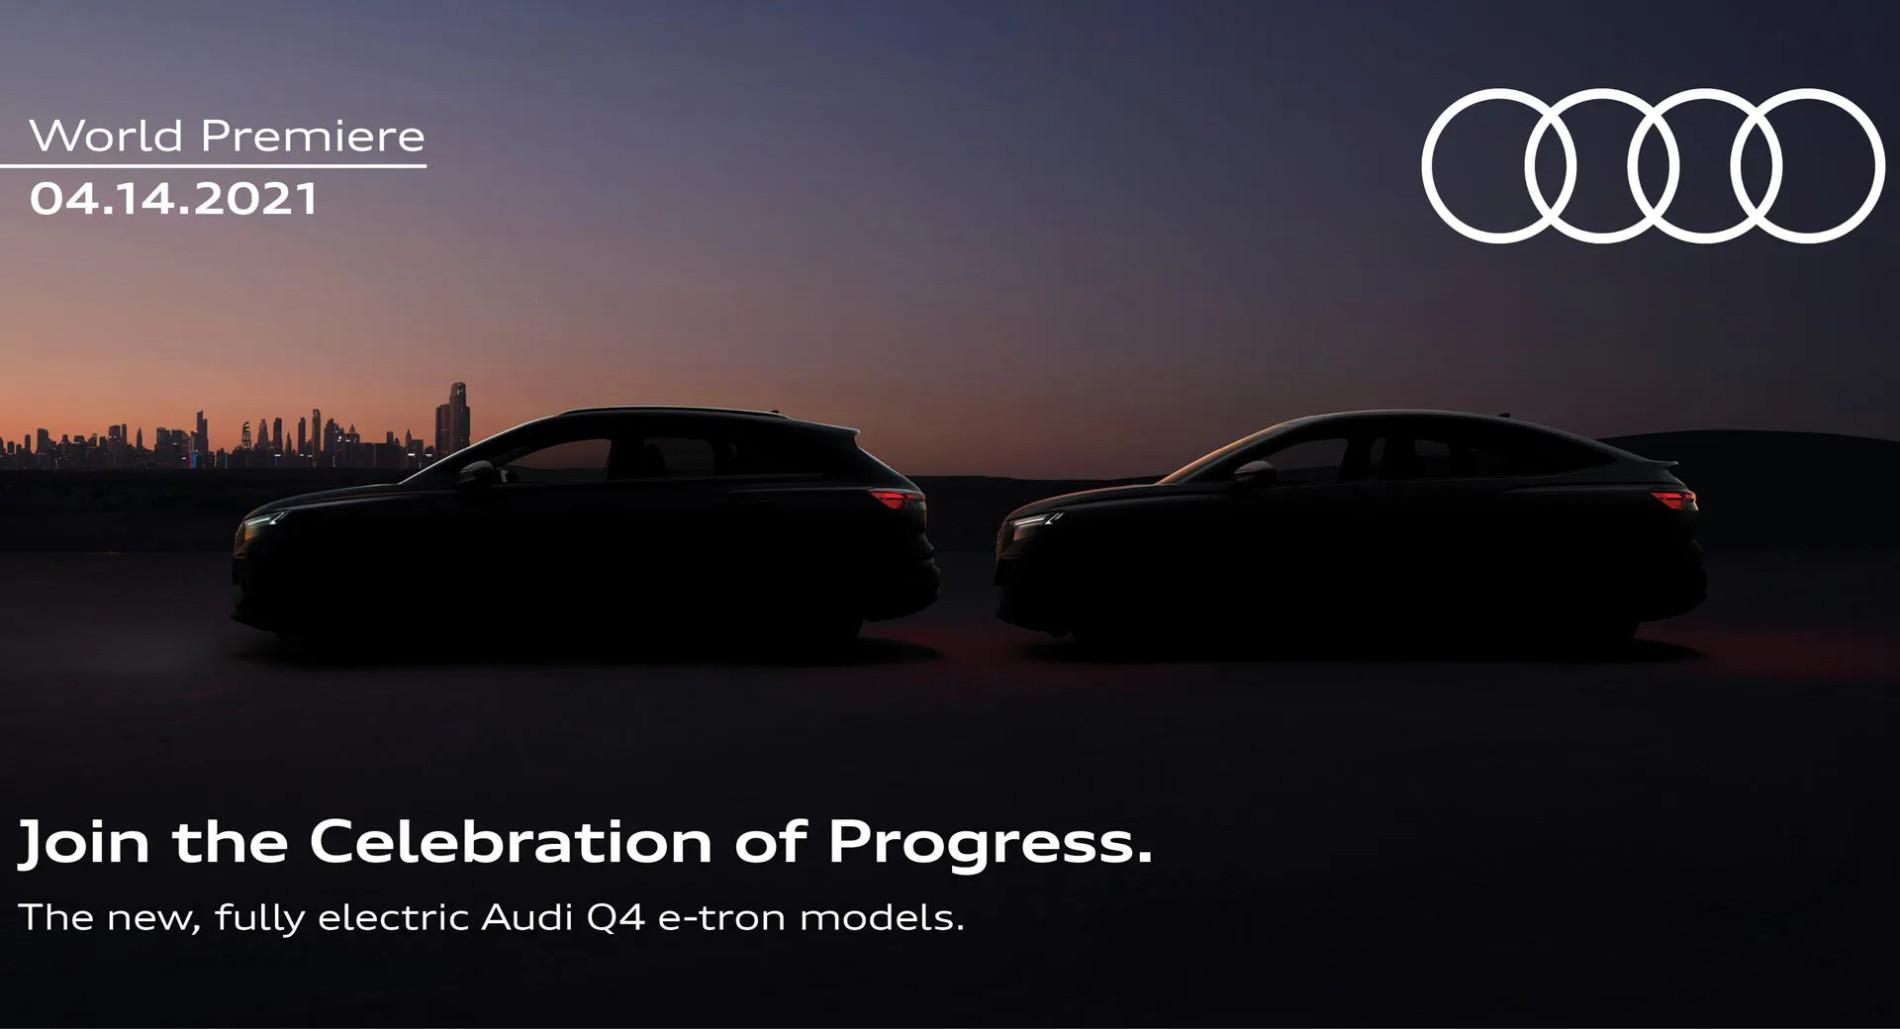 Audi Q4 E-Tron - Teaser - Audi Q4 E-Tron - Teaser